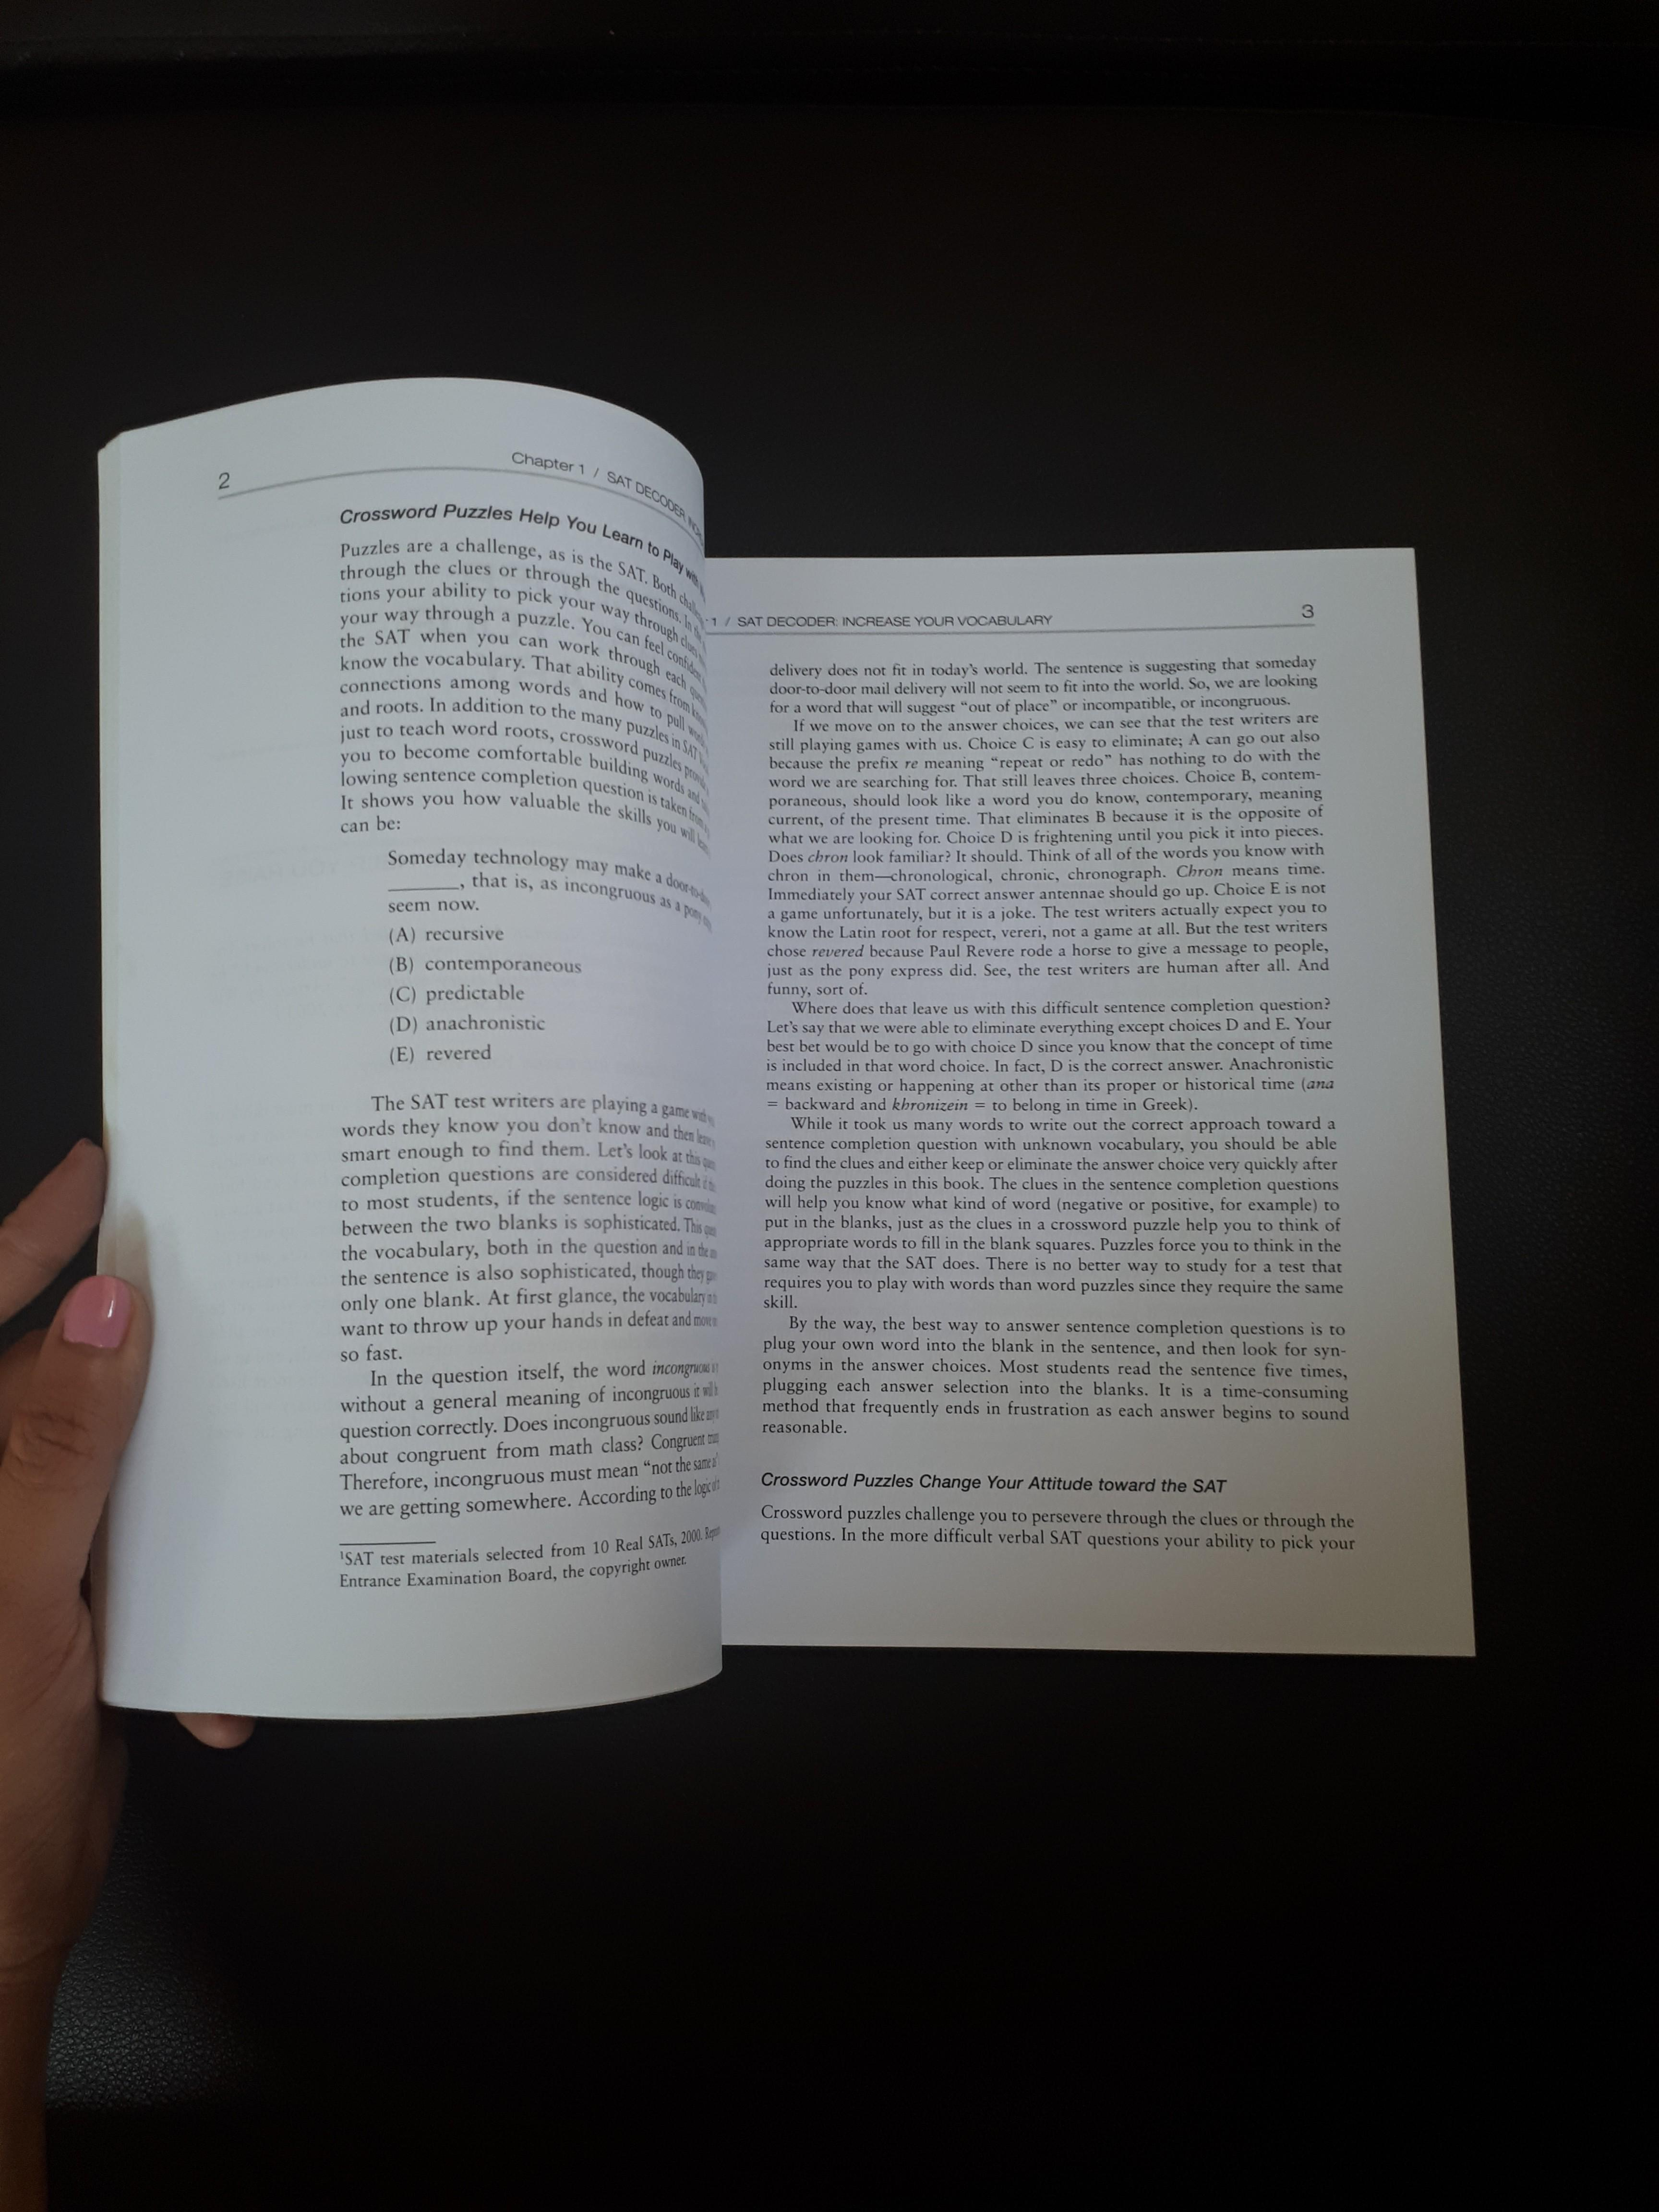 🌼 SAT Vocabulary Express, Books & Stationery, Textbooks on